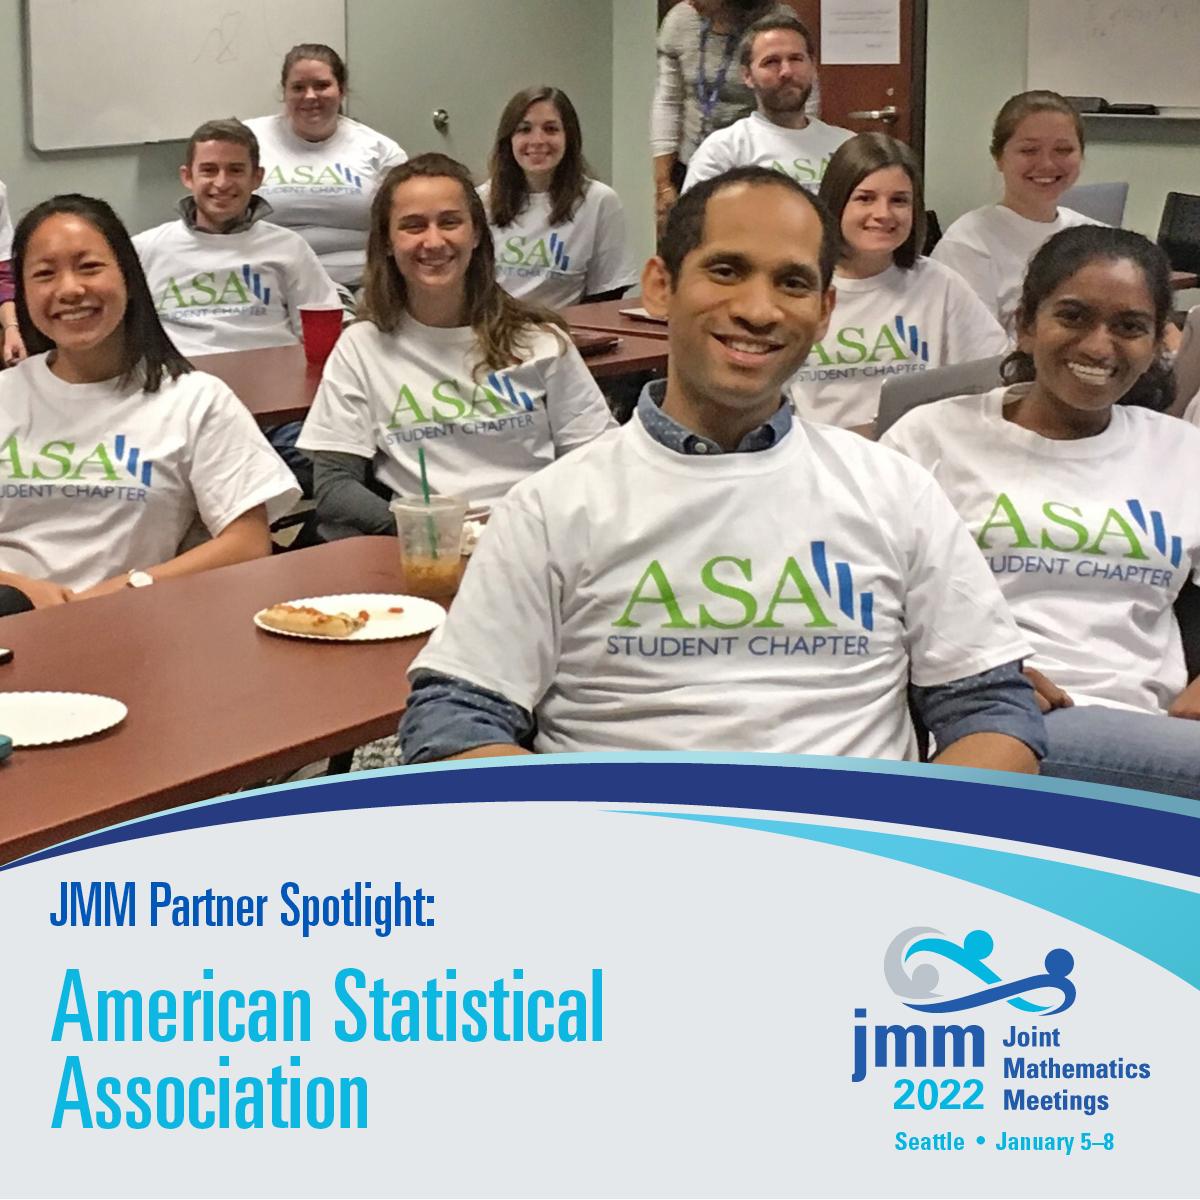 Students sitting at tables wearing shirts that say ASA Student Chapter